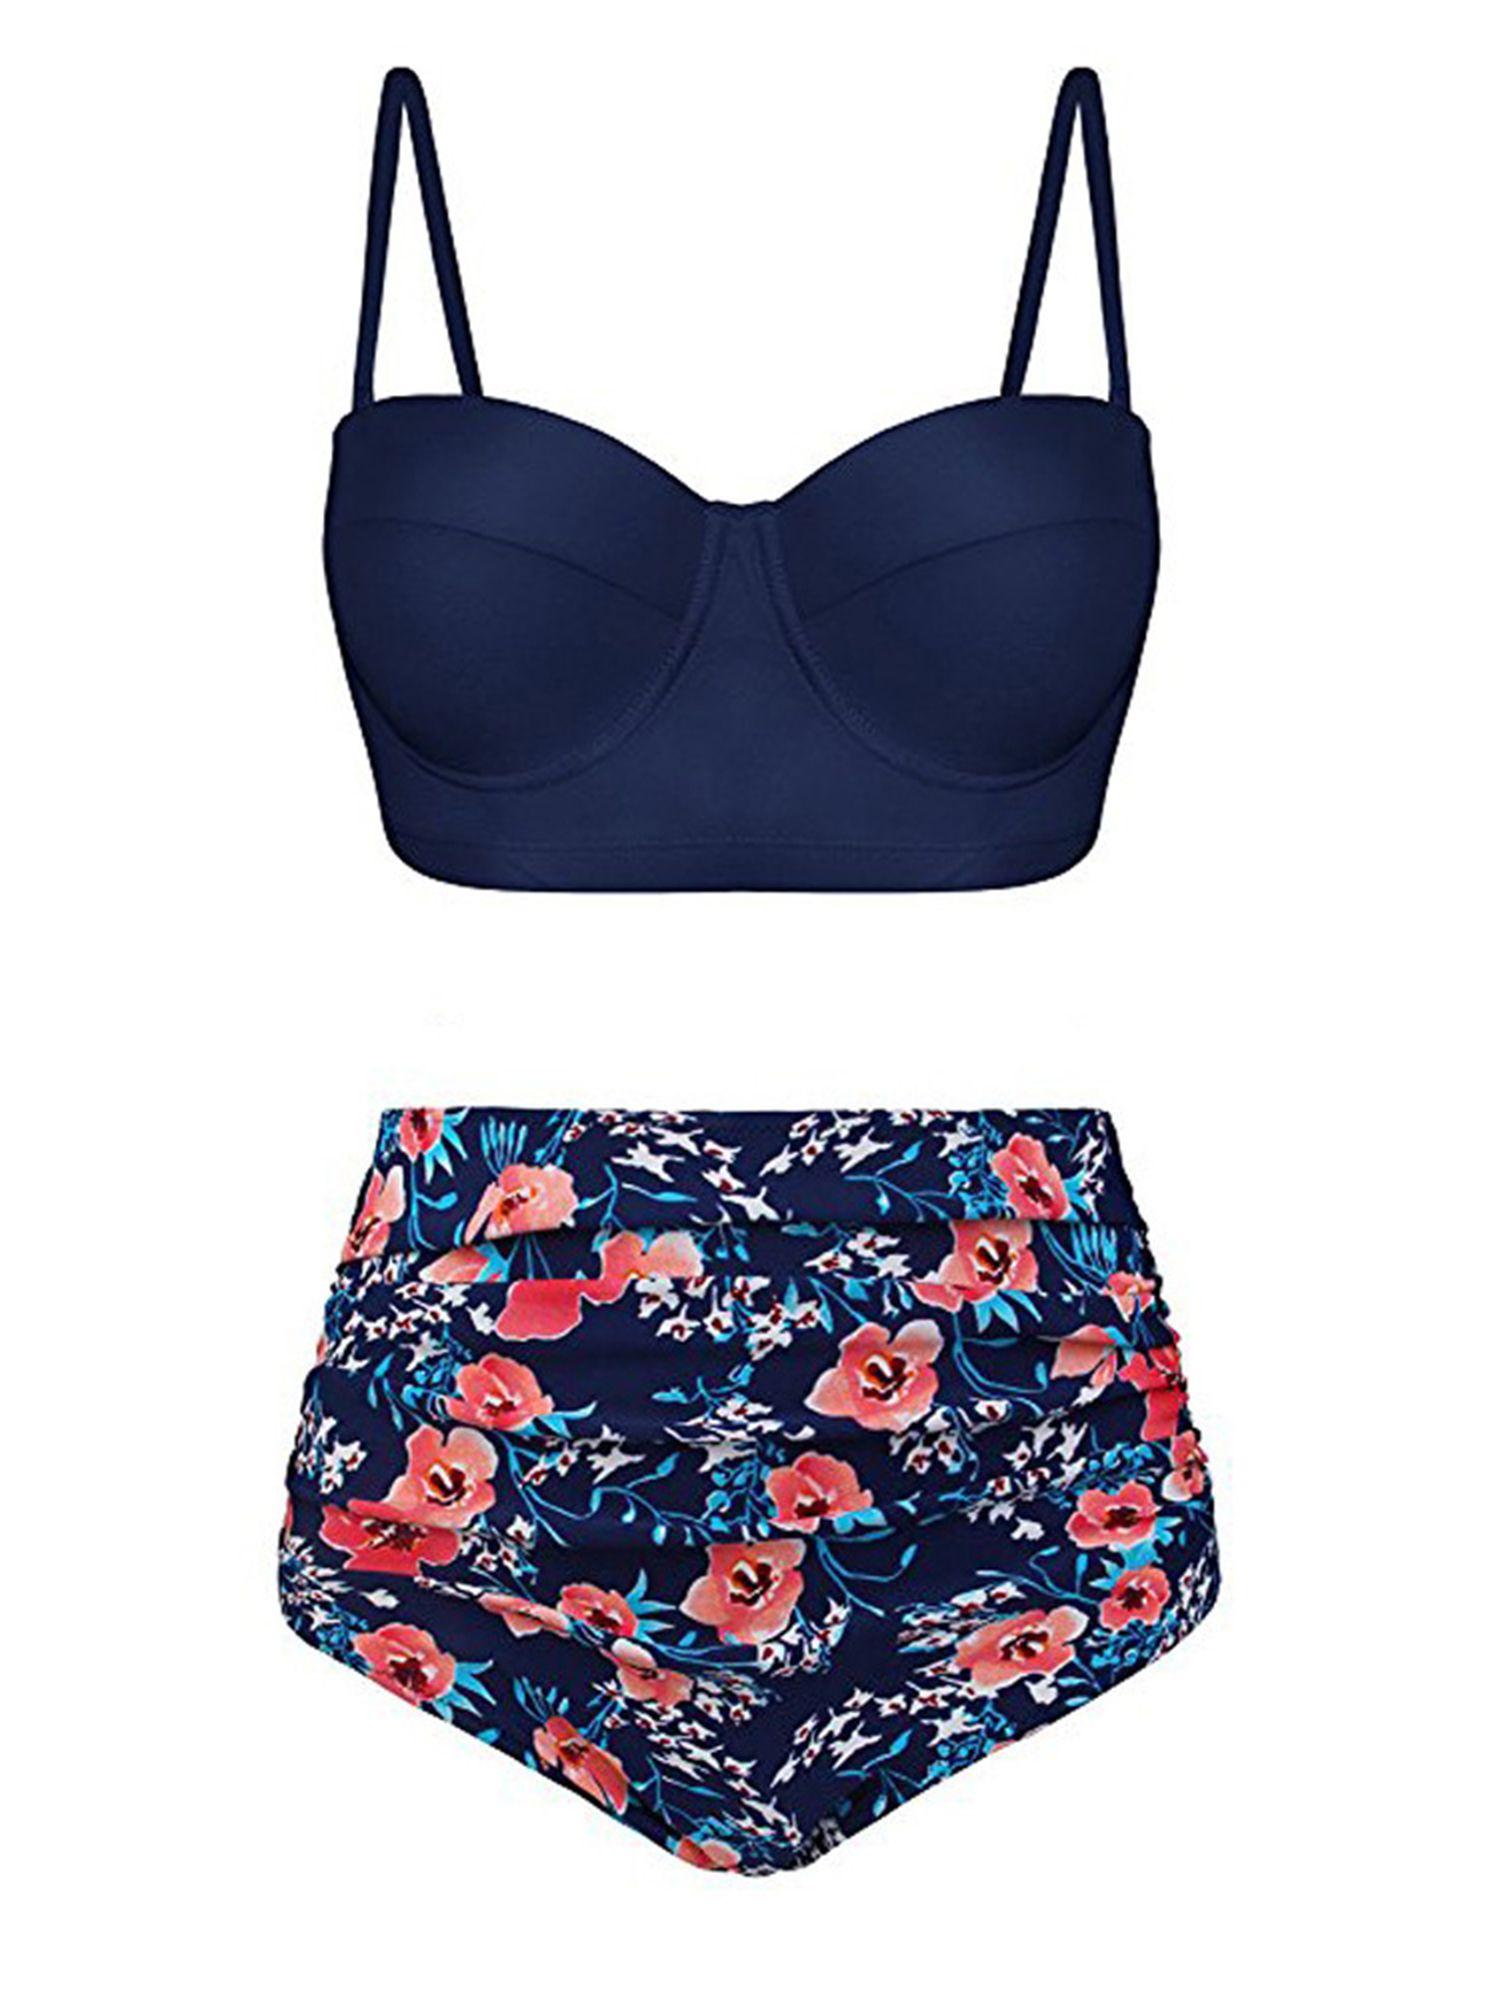 358dfe6f0d Women Sexy Two Piece Push Up Padded Bra Thong Swimsuit High Waist Bikini  Set Swimwear Bathing Suit Swimsuit Beachwear #Ad #Bra, #spon, #Padded, # Swimsuit